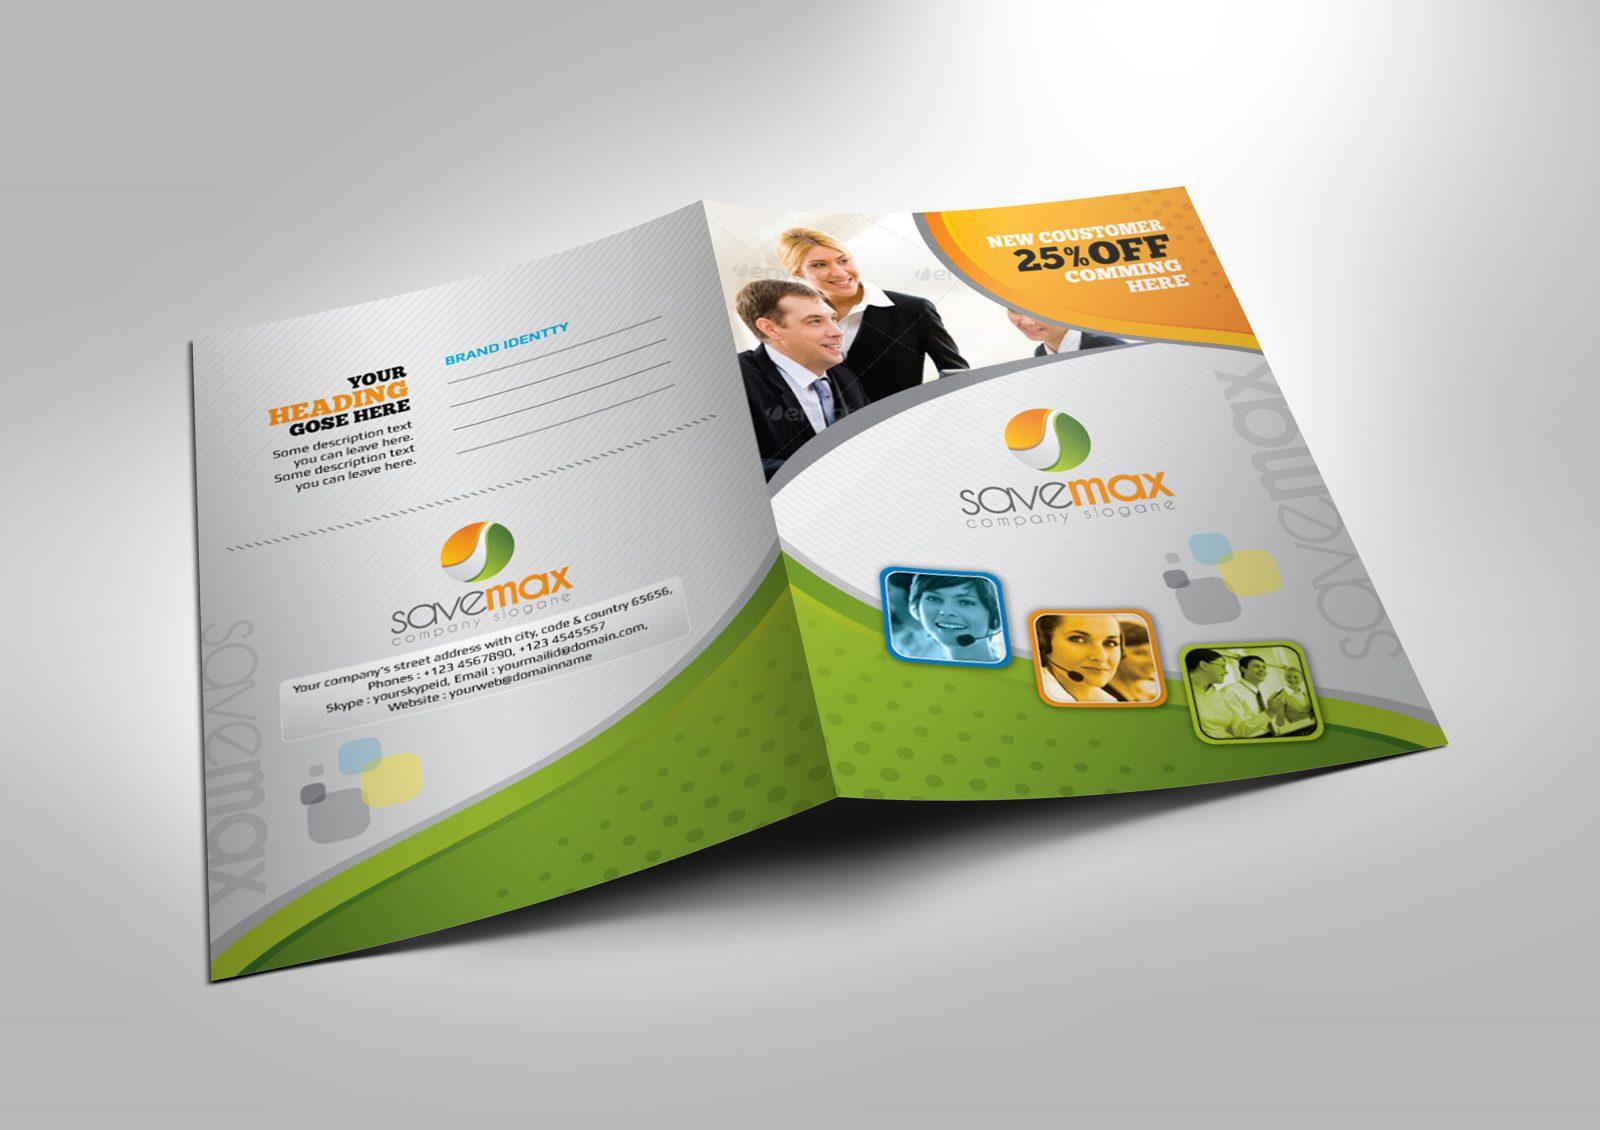 savemax corporate presentation folder design template. Black Bedroom Furniture Sets. Home Design Ideas